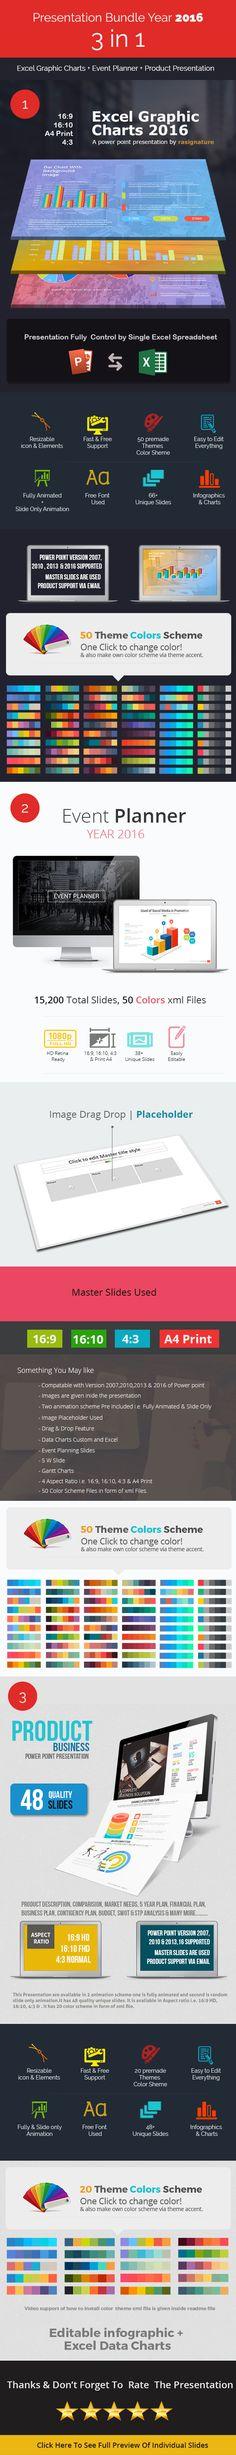 sticky note powerpoint presentation template | best powerpoint, Presentation templates